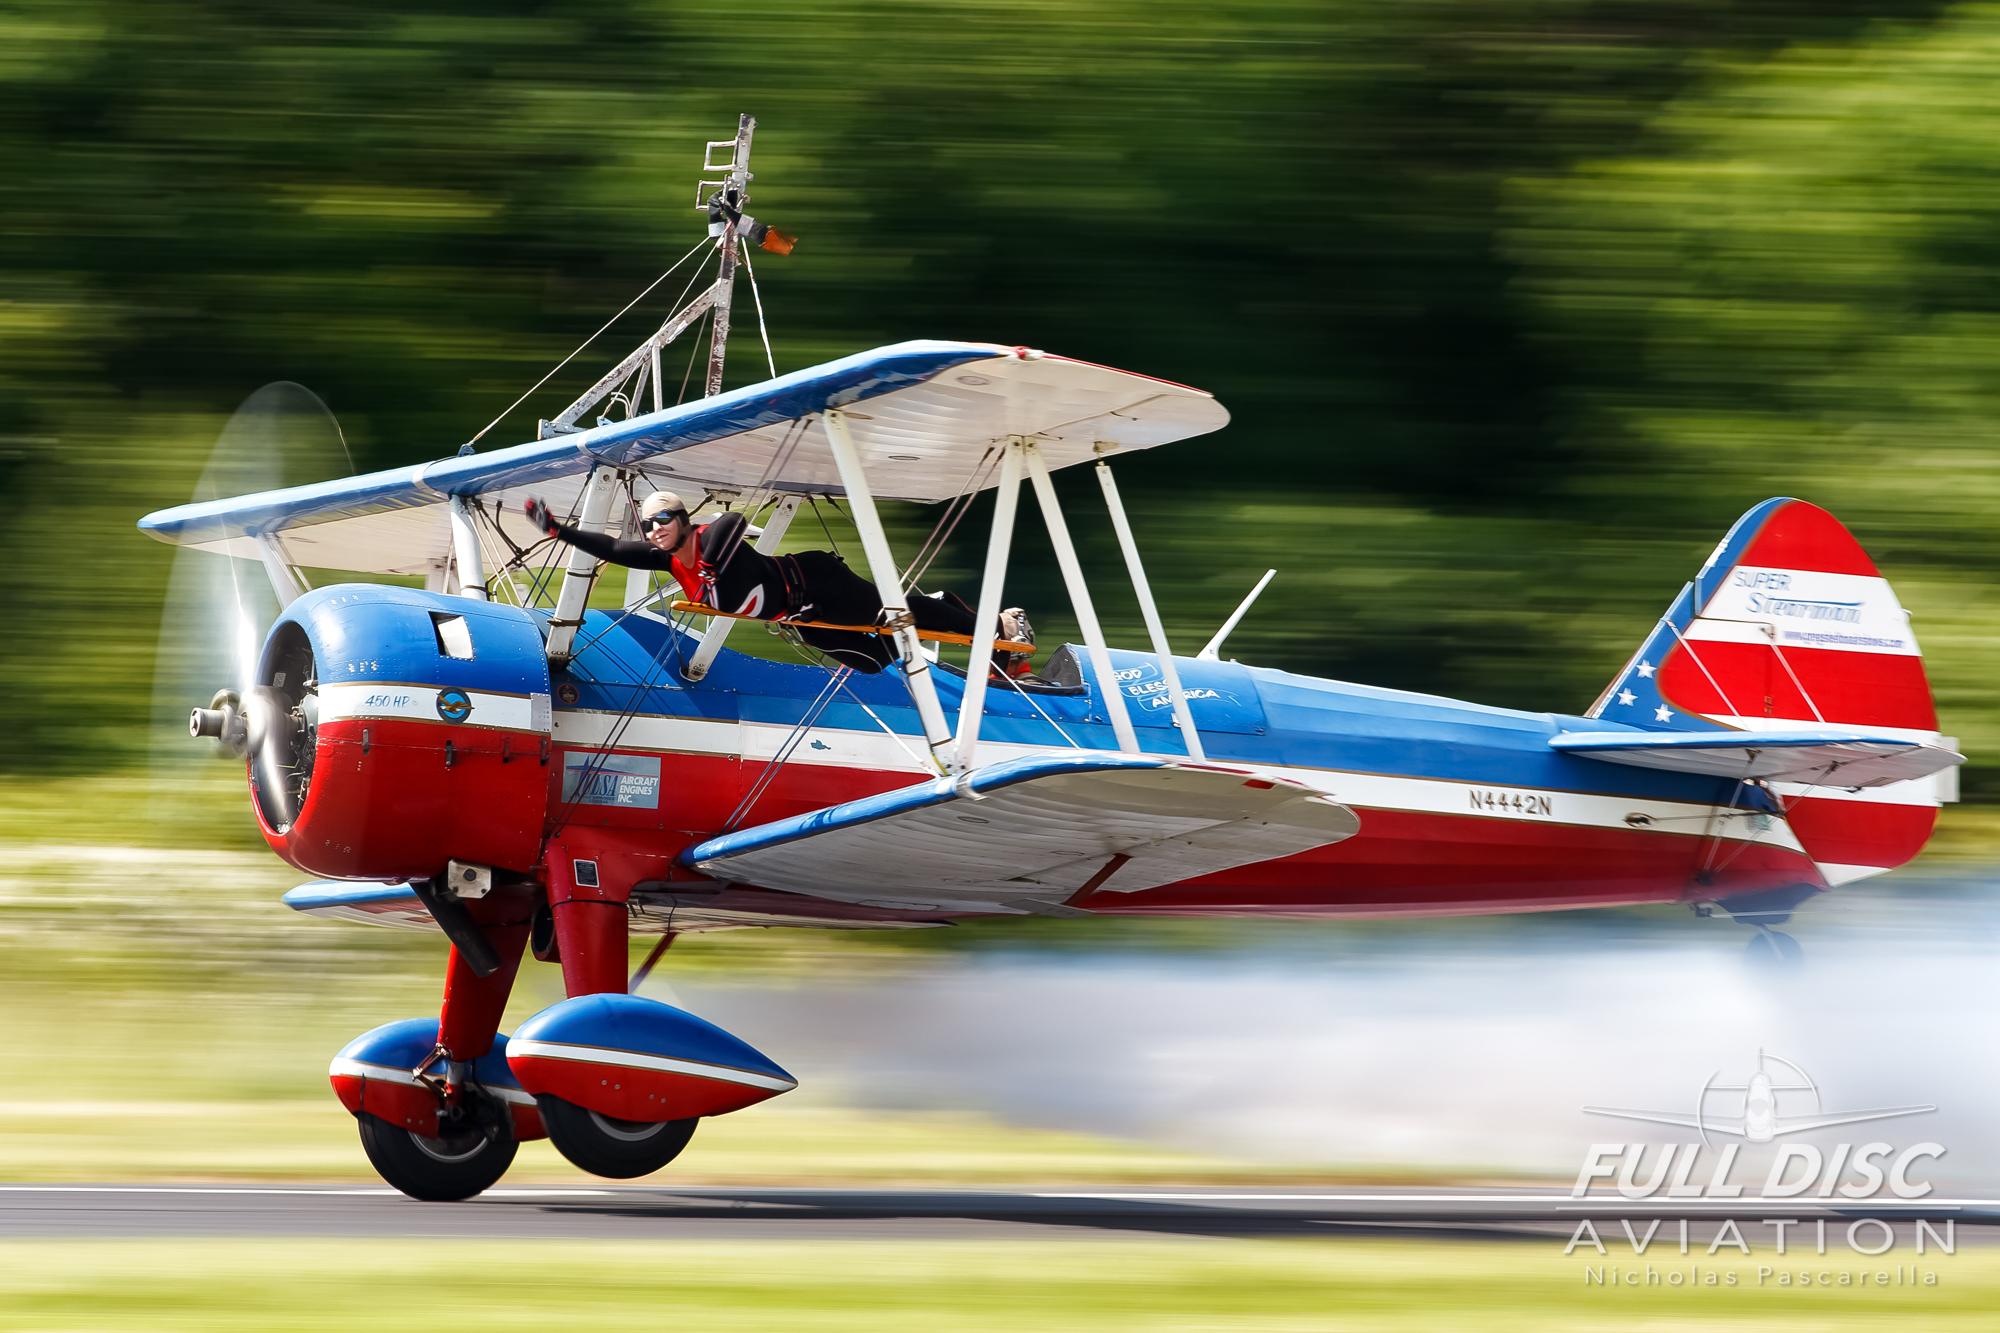 nickpascarella_nicholaspascarella_fulldiscaviation_aircraft_stearman_wingwalking_takeoff_gregsheltonairshows.jpg